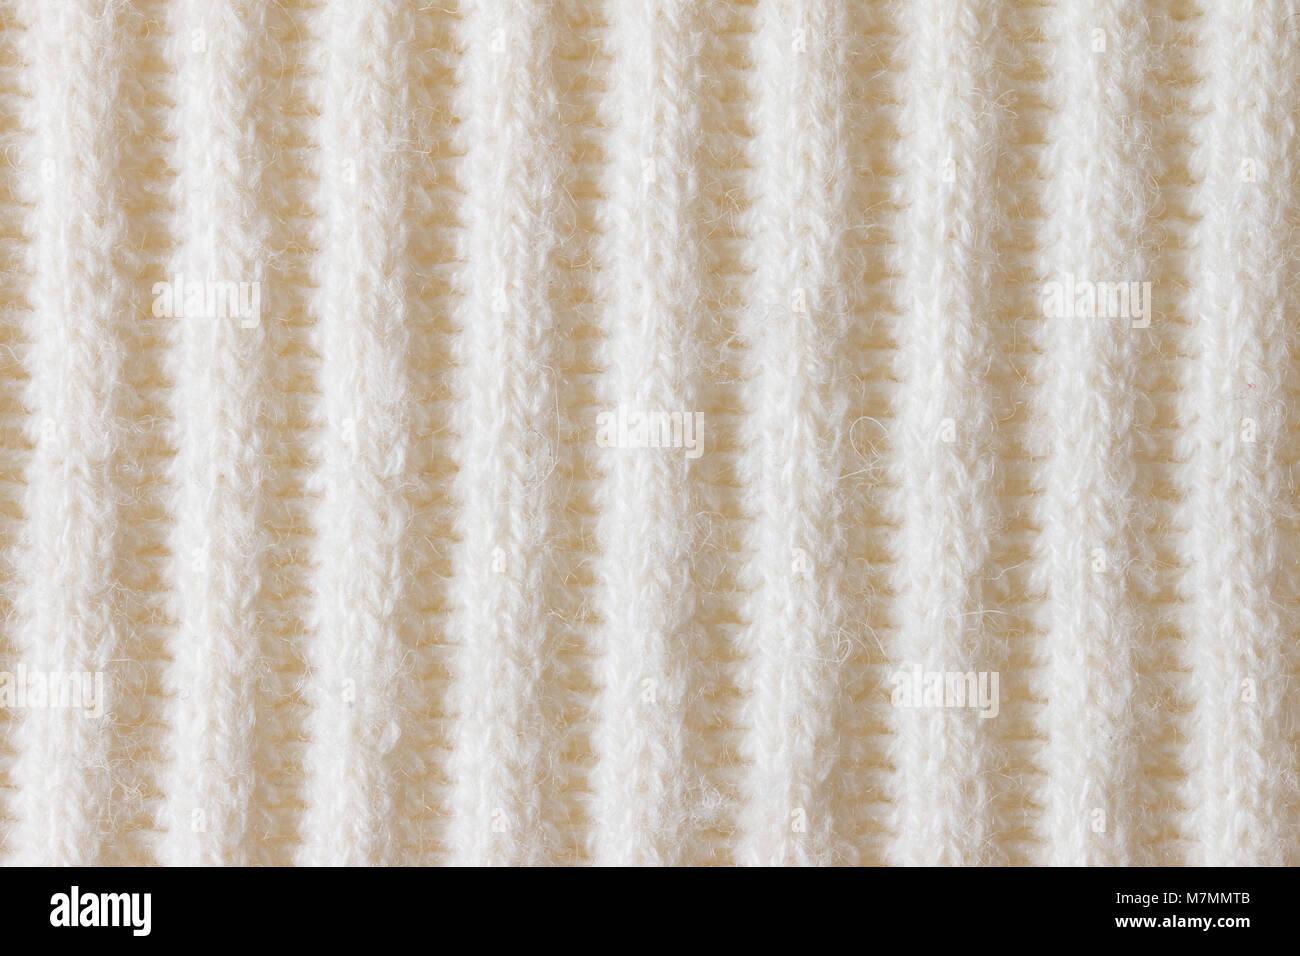 Knitted Pattern Imágenes De Stock & Knitted Pattern Fotos De Stock ...